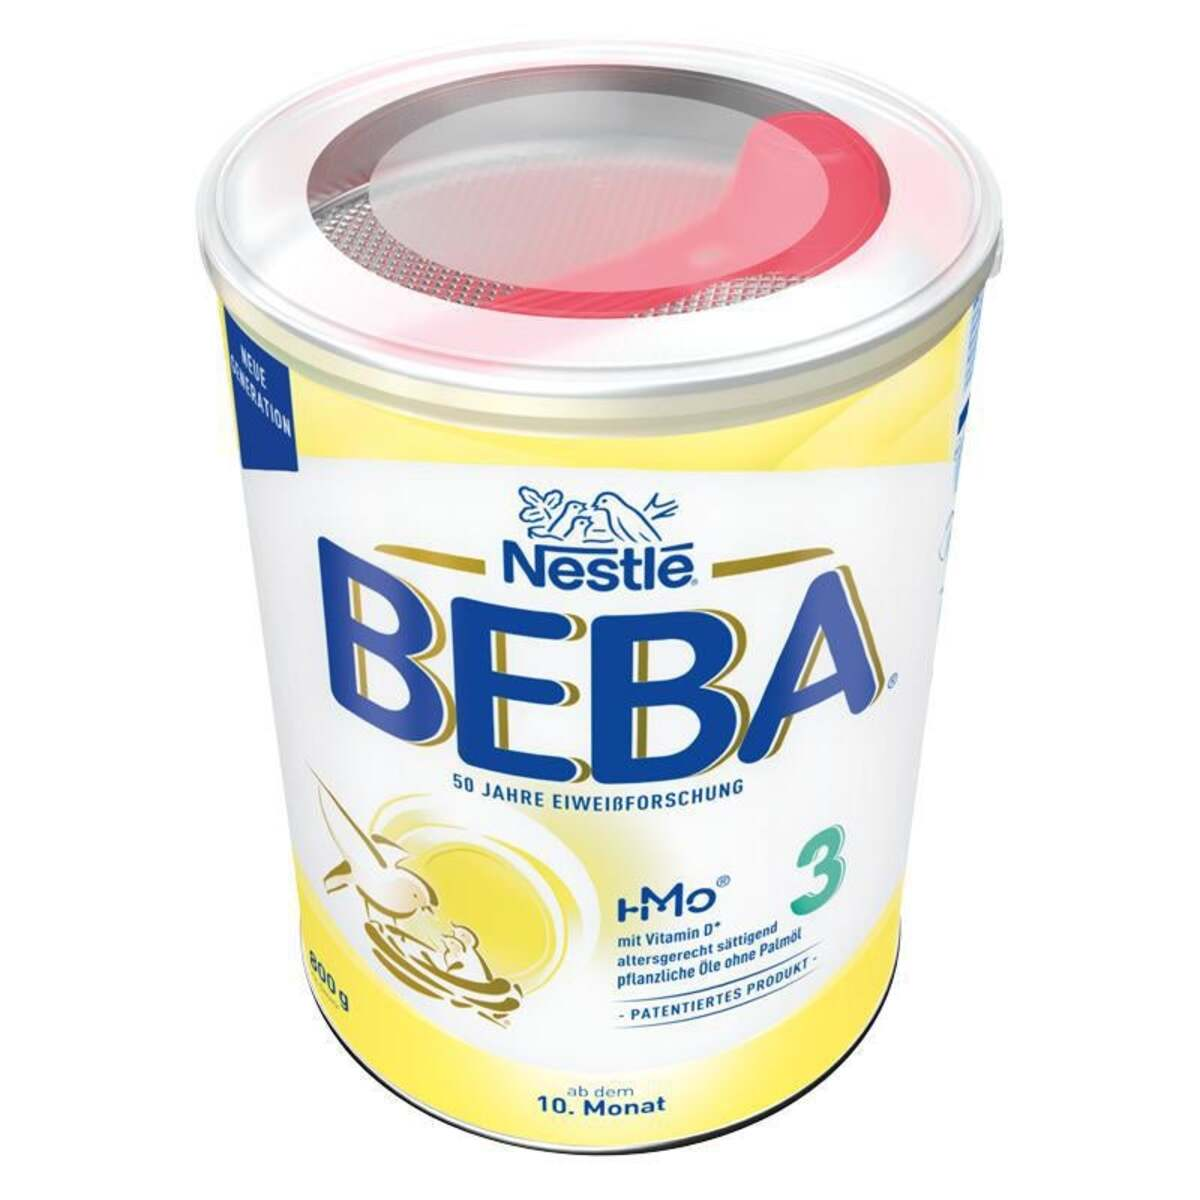 Bild 5 von BEBA 3 ab dem 10. Monat